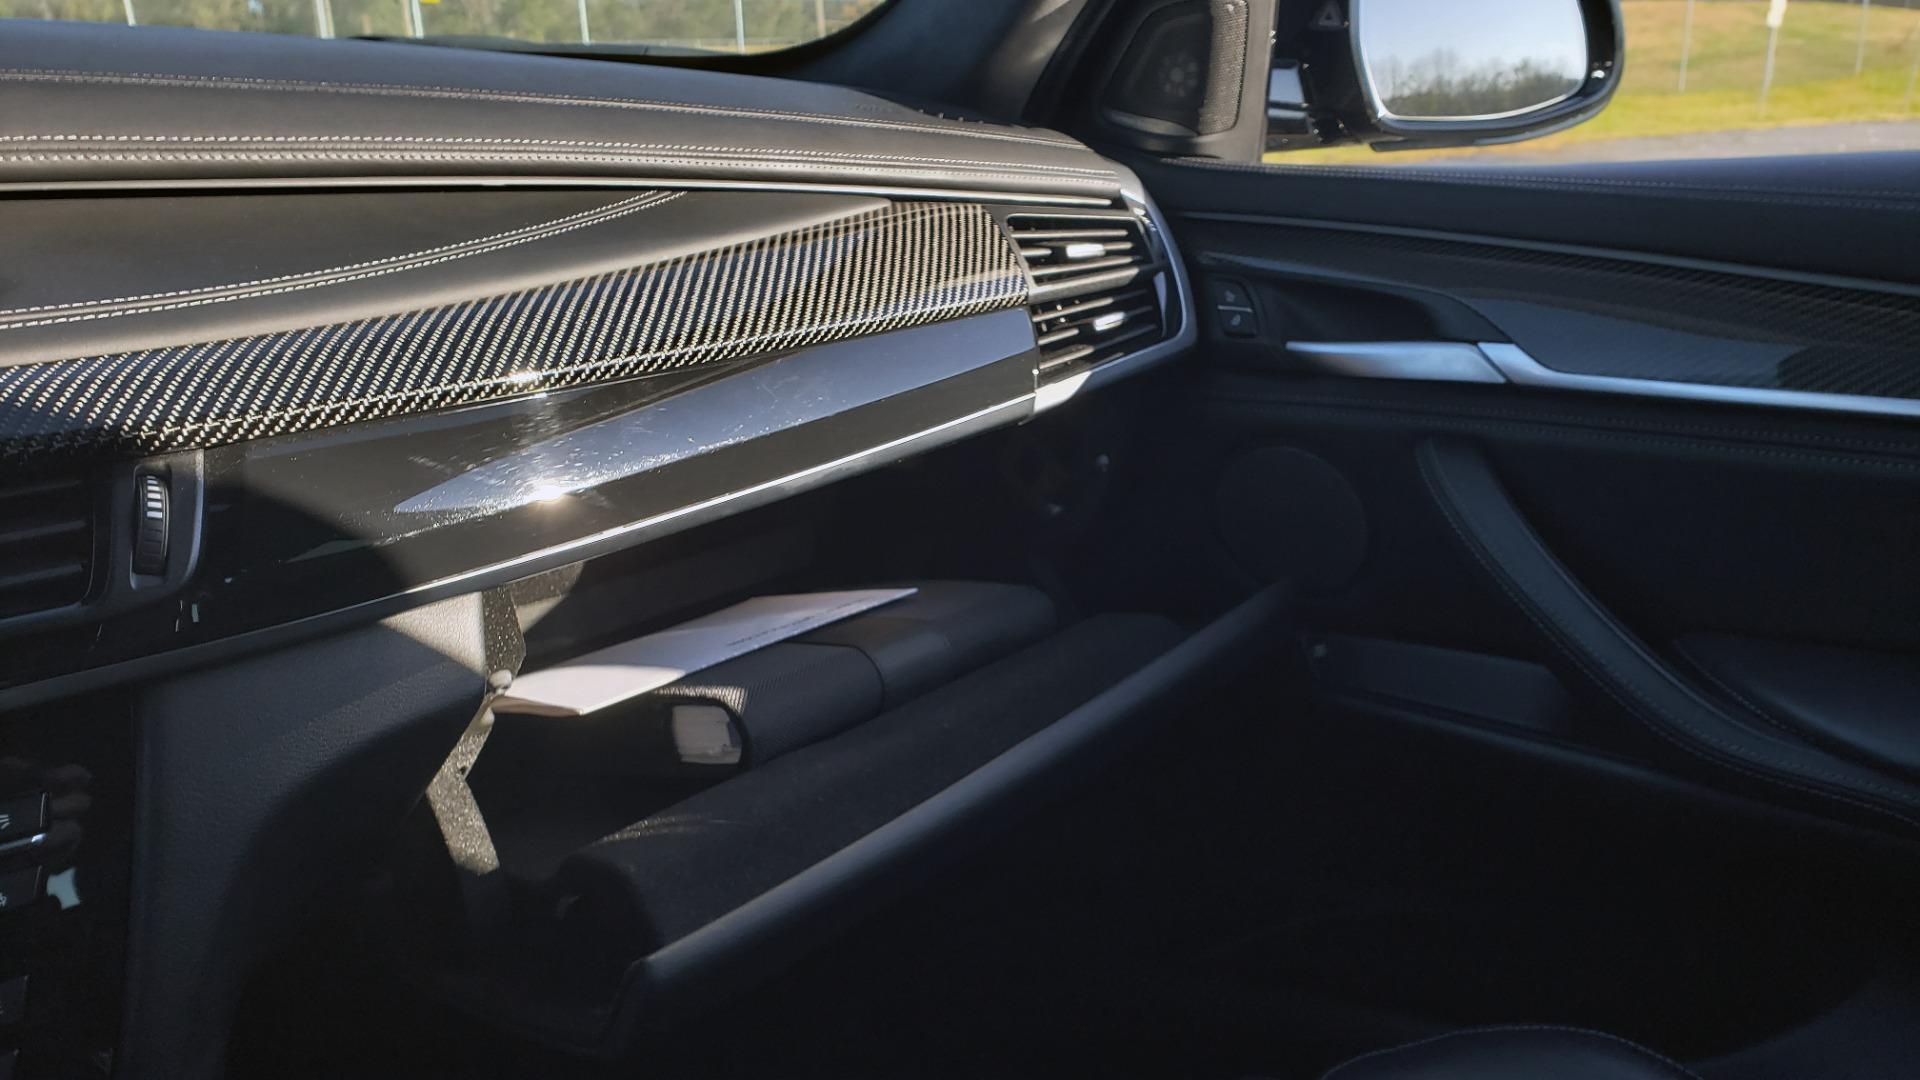 Used 2016 BMW X6 M EXEC PKG / DRVR ASST / NAV / SUNROOF / BLIND SPOT / REARVIEW for sale Sold at Formula Imports in Charlotte NC 28227 59